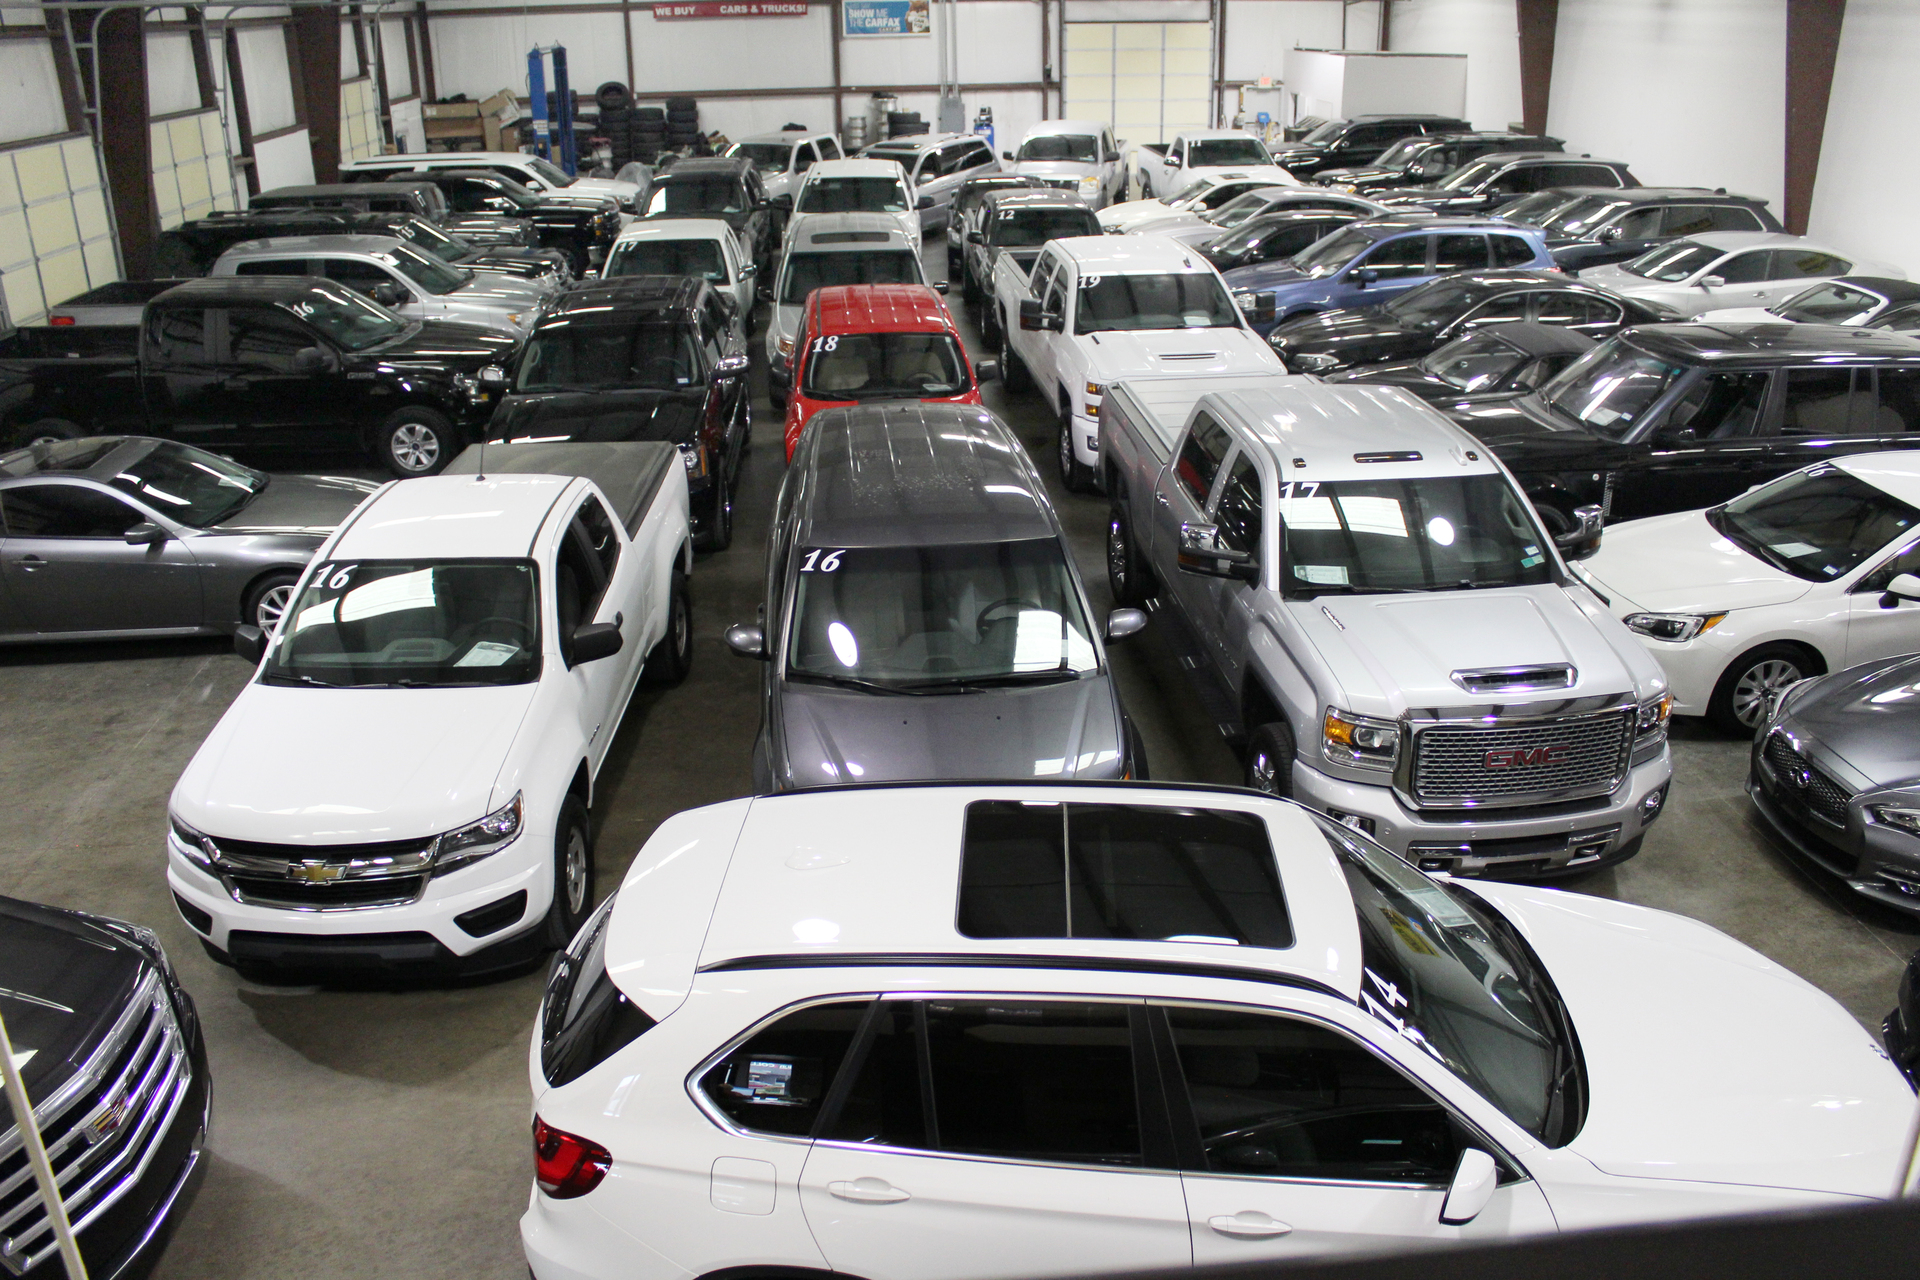 Used Cars Plano | Used Car Dealer Plano | Auto Locators of Texas